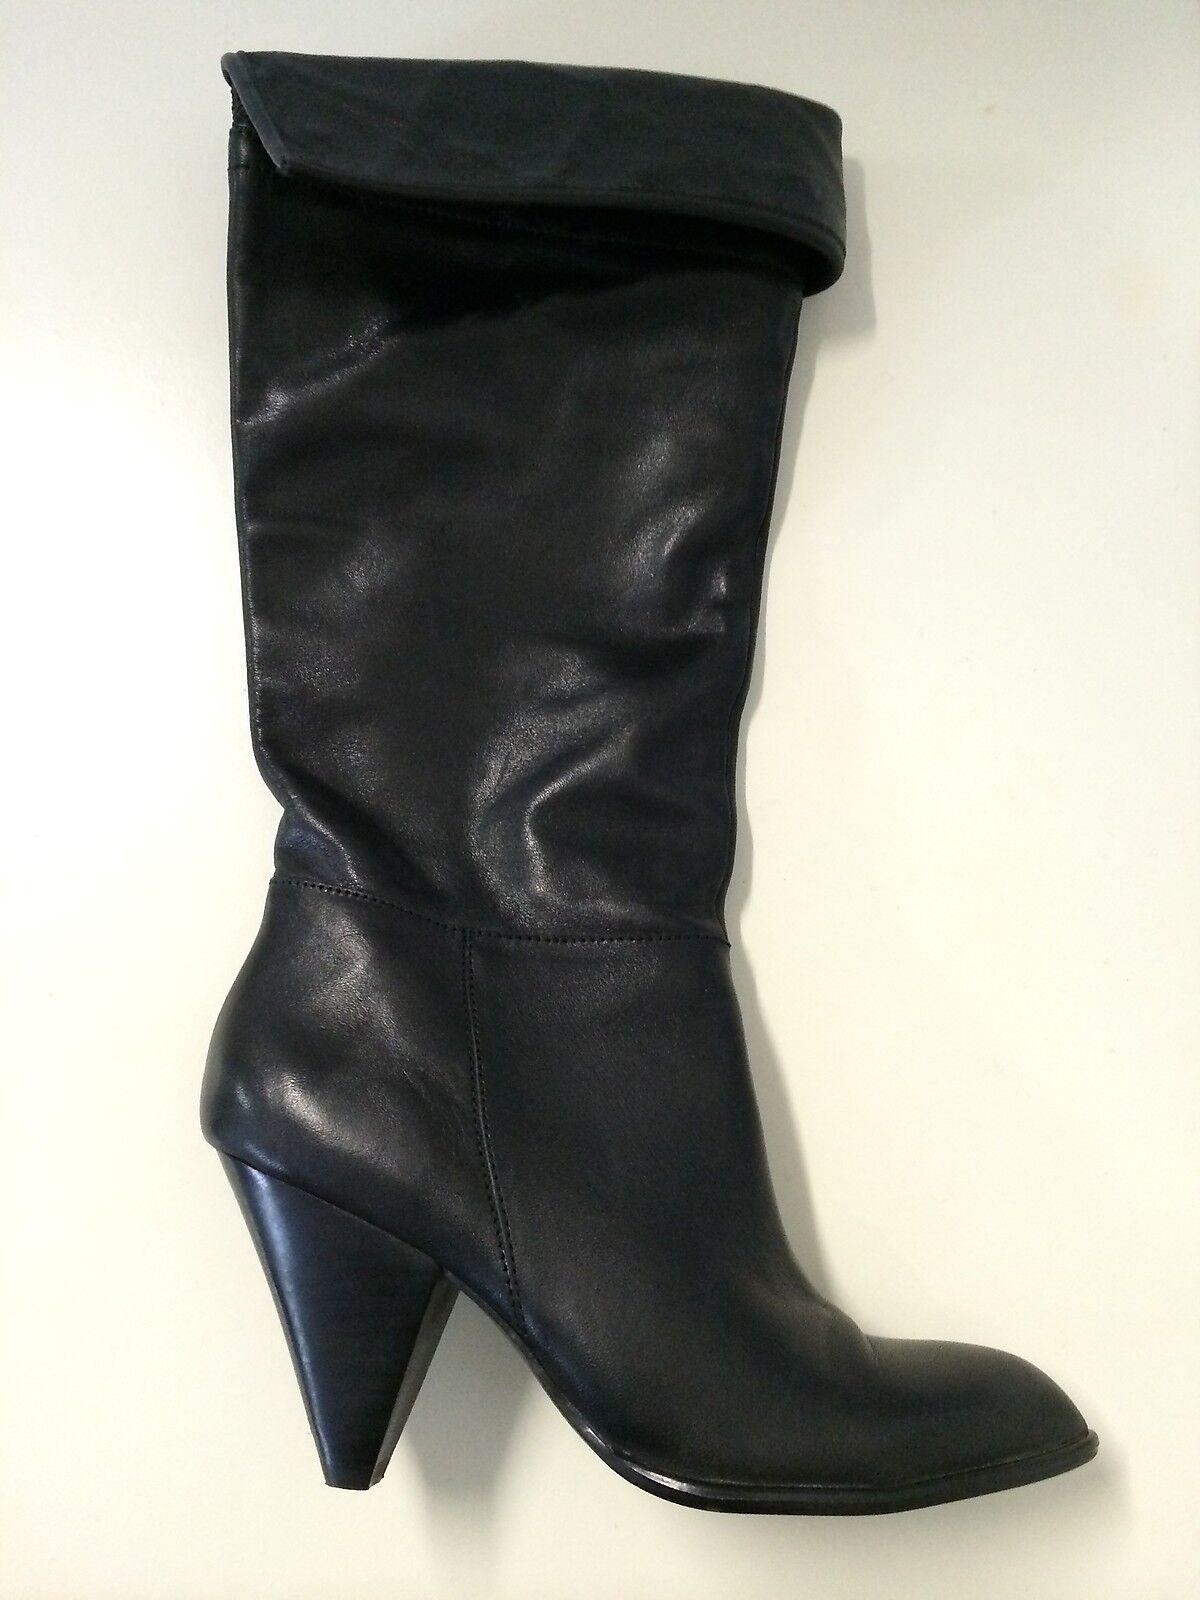 B. Makowsky Fleeza Black Leather High Boots Women's Size 6.5 NWOB